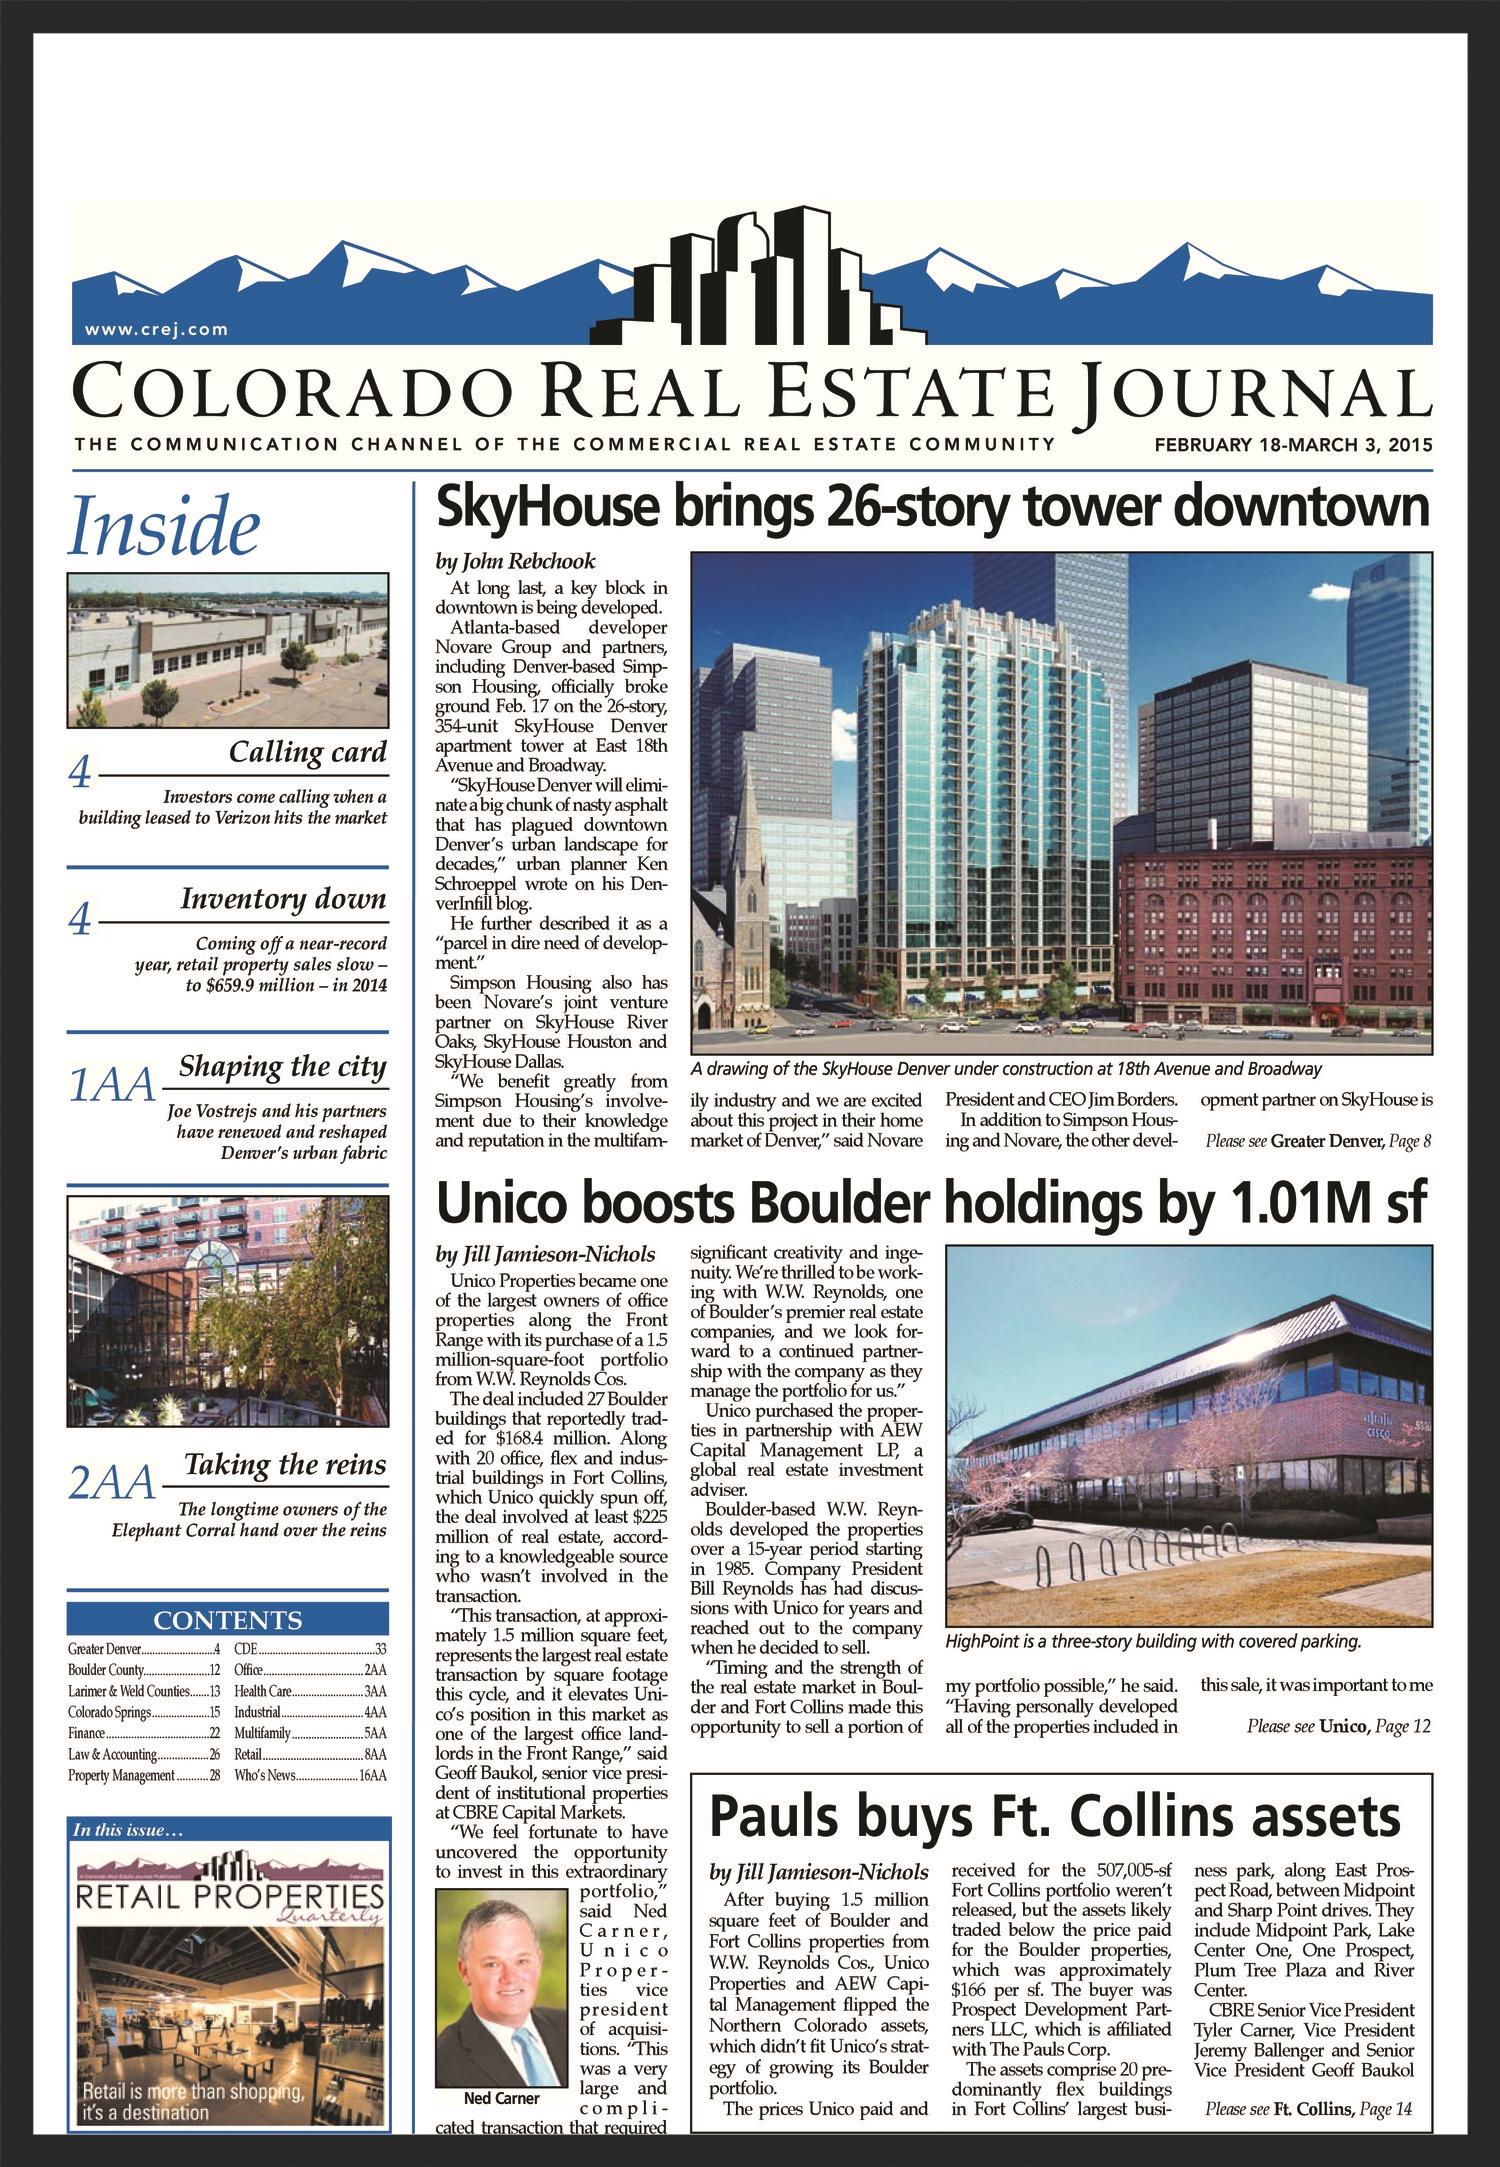 UNICO  Colorado Real Estate Journal  02.18.2015